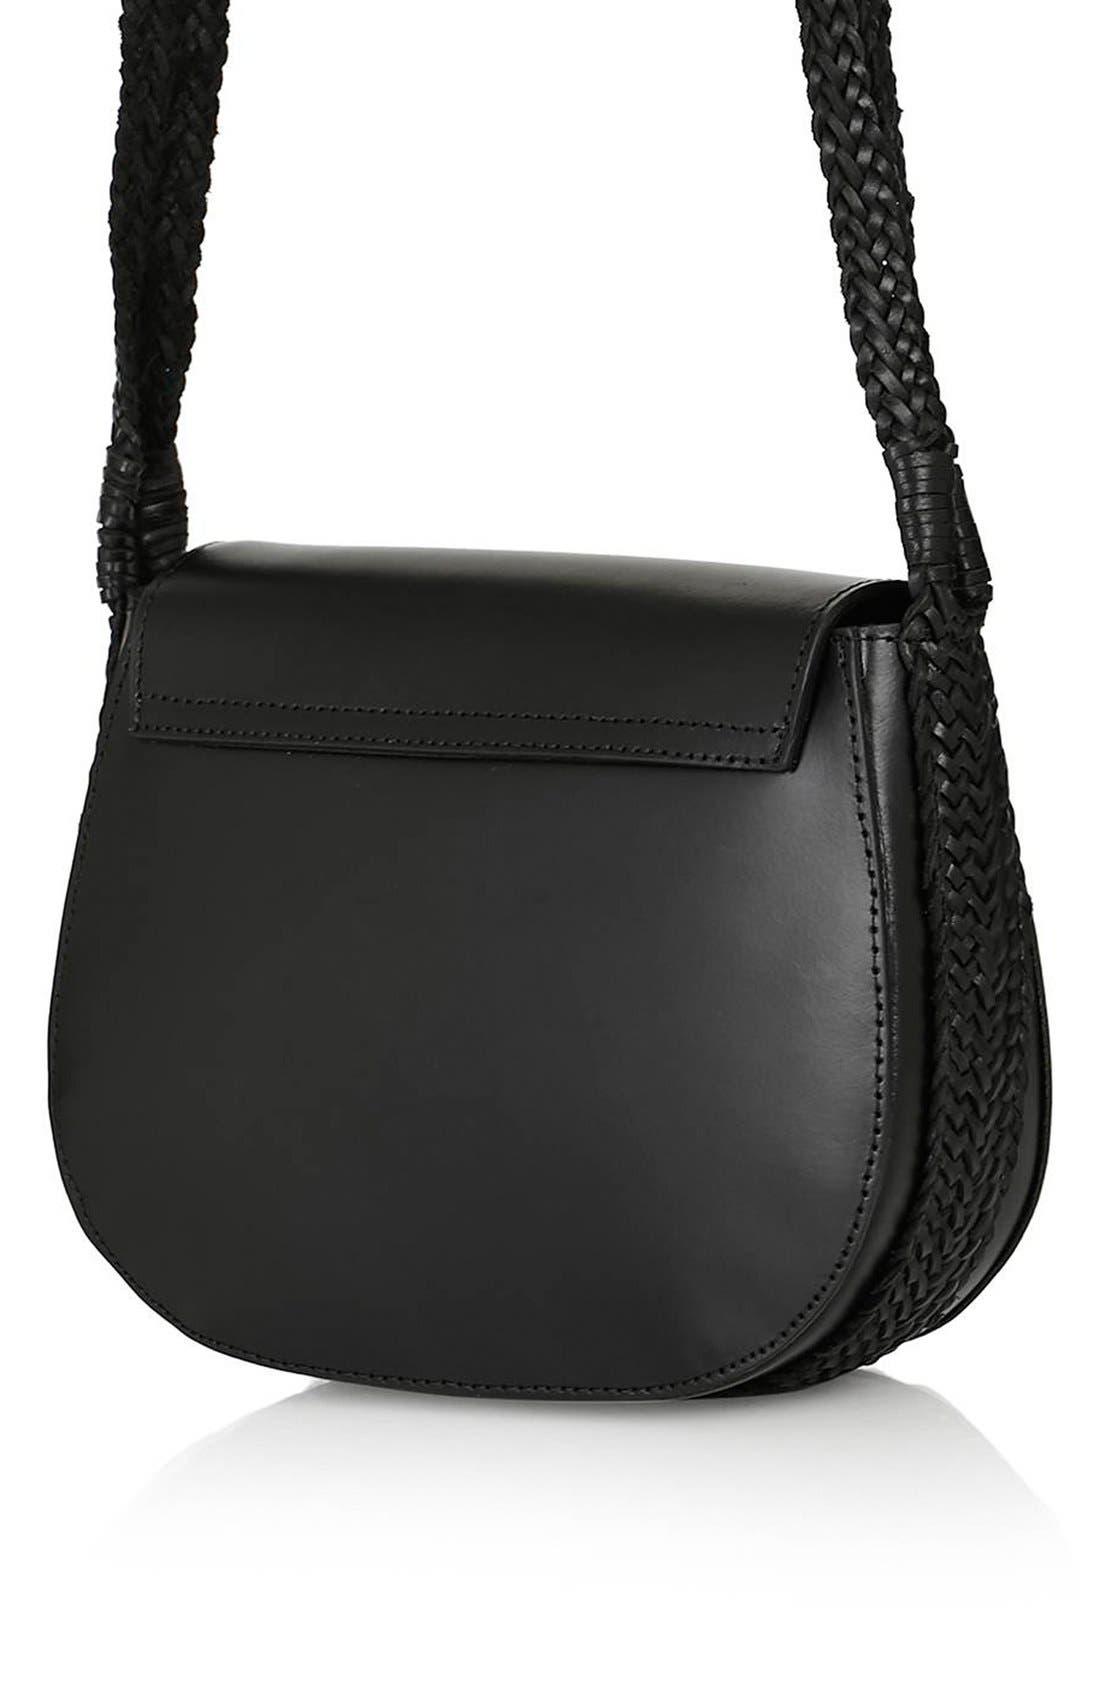 TOPSHOP, Woven Strap Leather Saddle Bag, Alternate thumbnail 5, color, 001